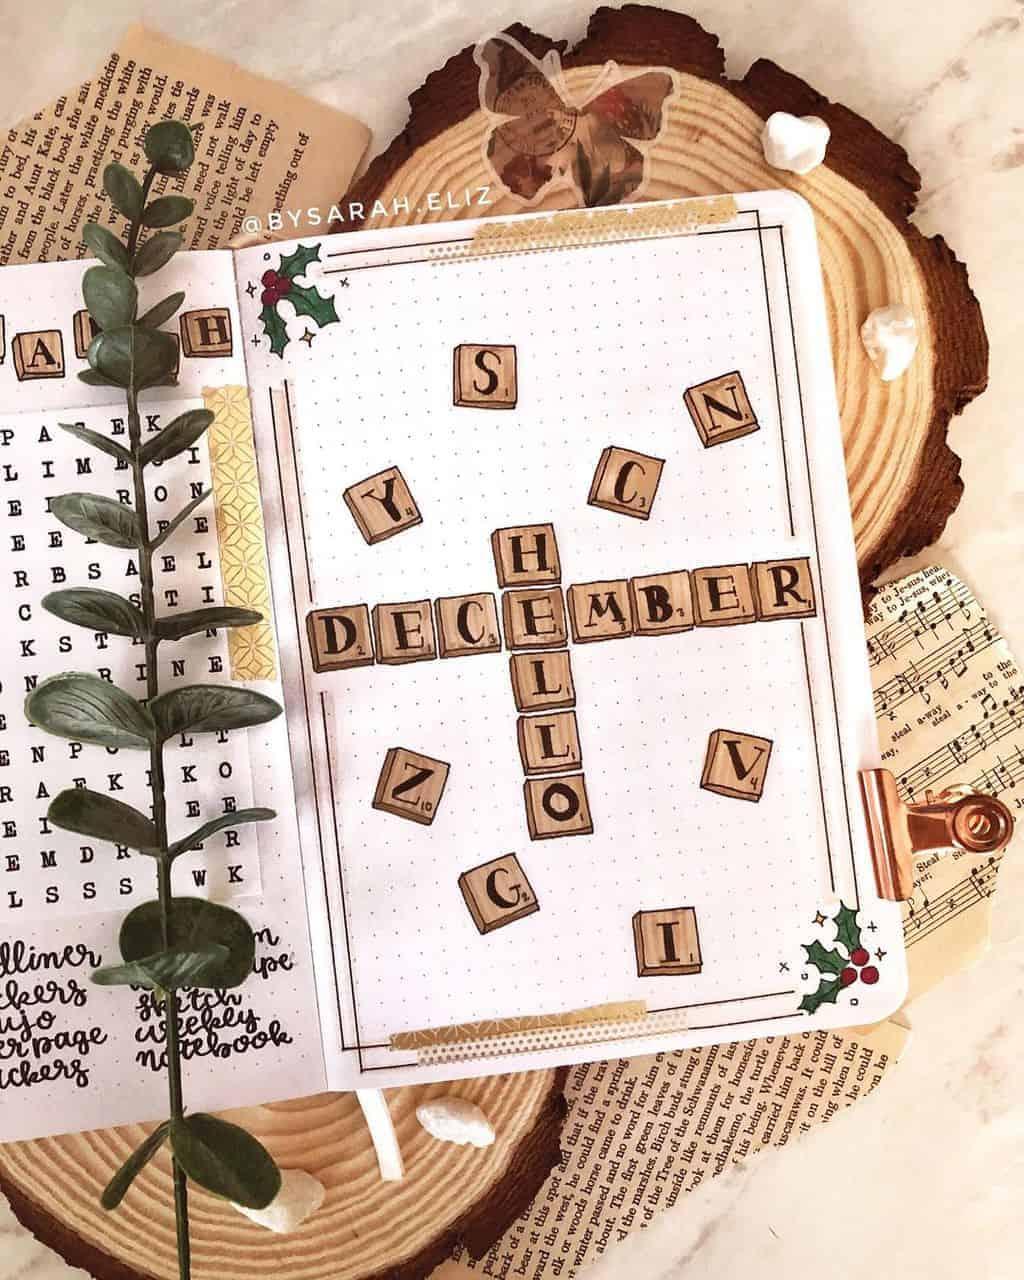 Winter Bullet Journal Inspirations, cover page by @bysarah.eliz | Masha Plans